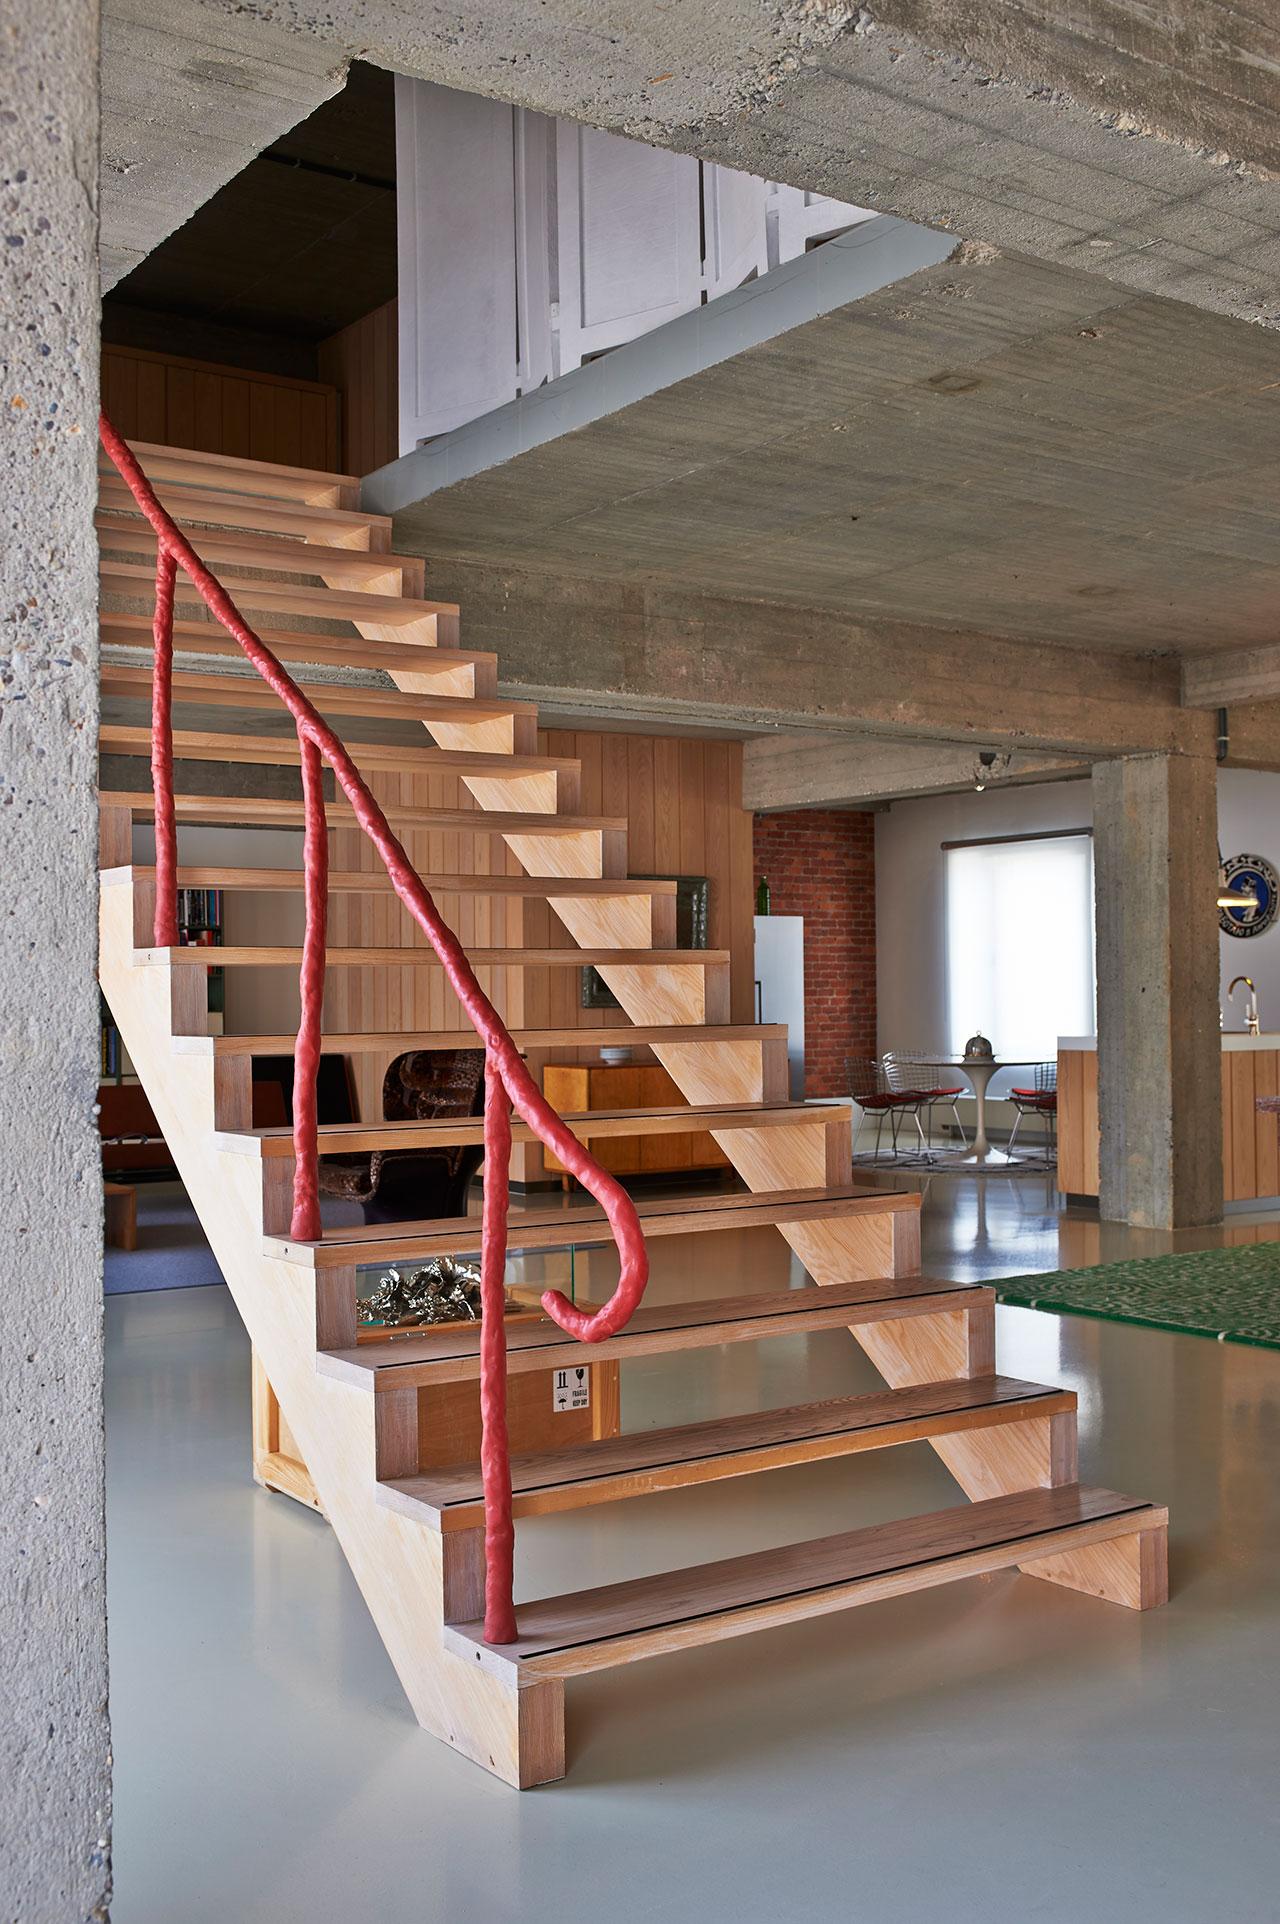 Stairway. Handrail: Clay, Maarten Baas, 2010.Roundtable: Knoll Eero Saarinen, 1953.Dome: Dome, Last Supper, Studio Job, 2009.Photo by Dennis Brandsma.